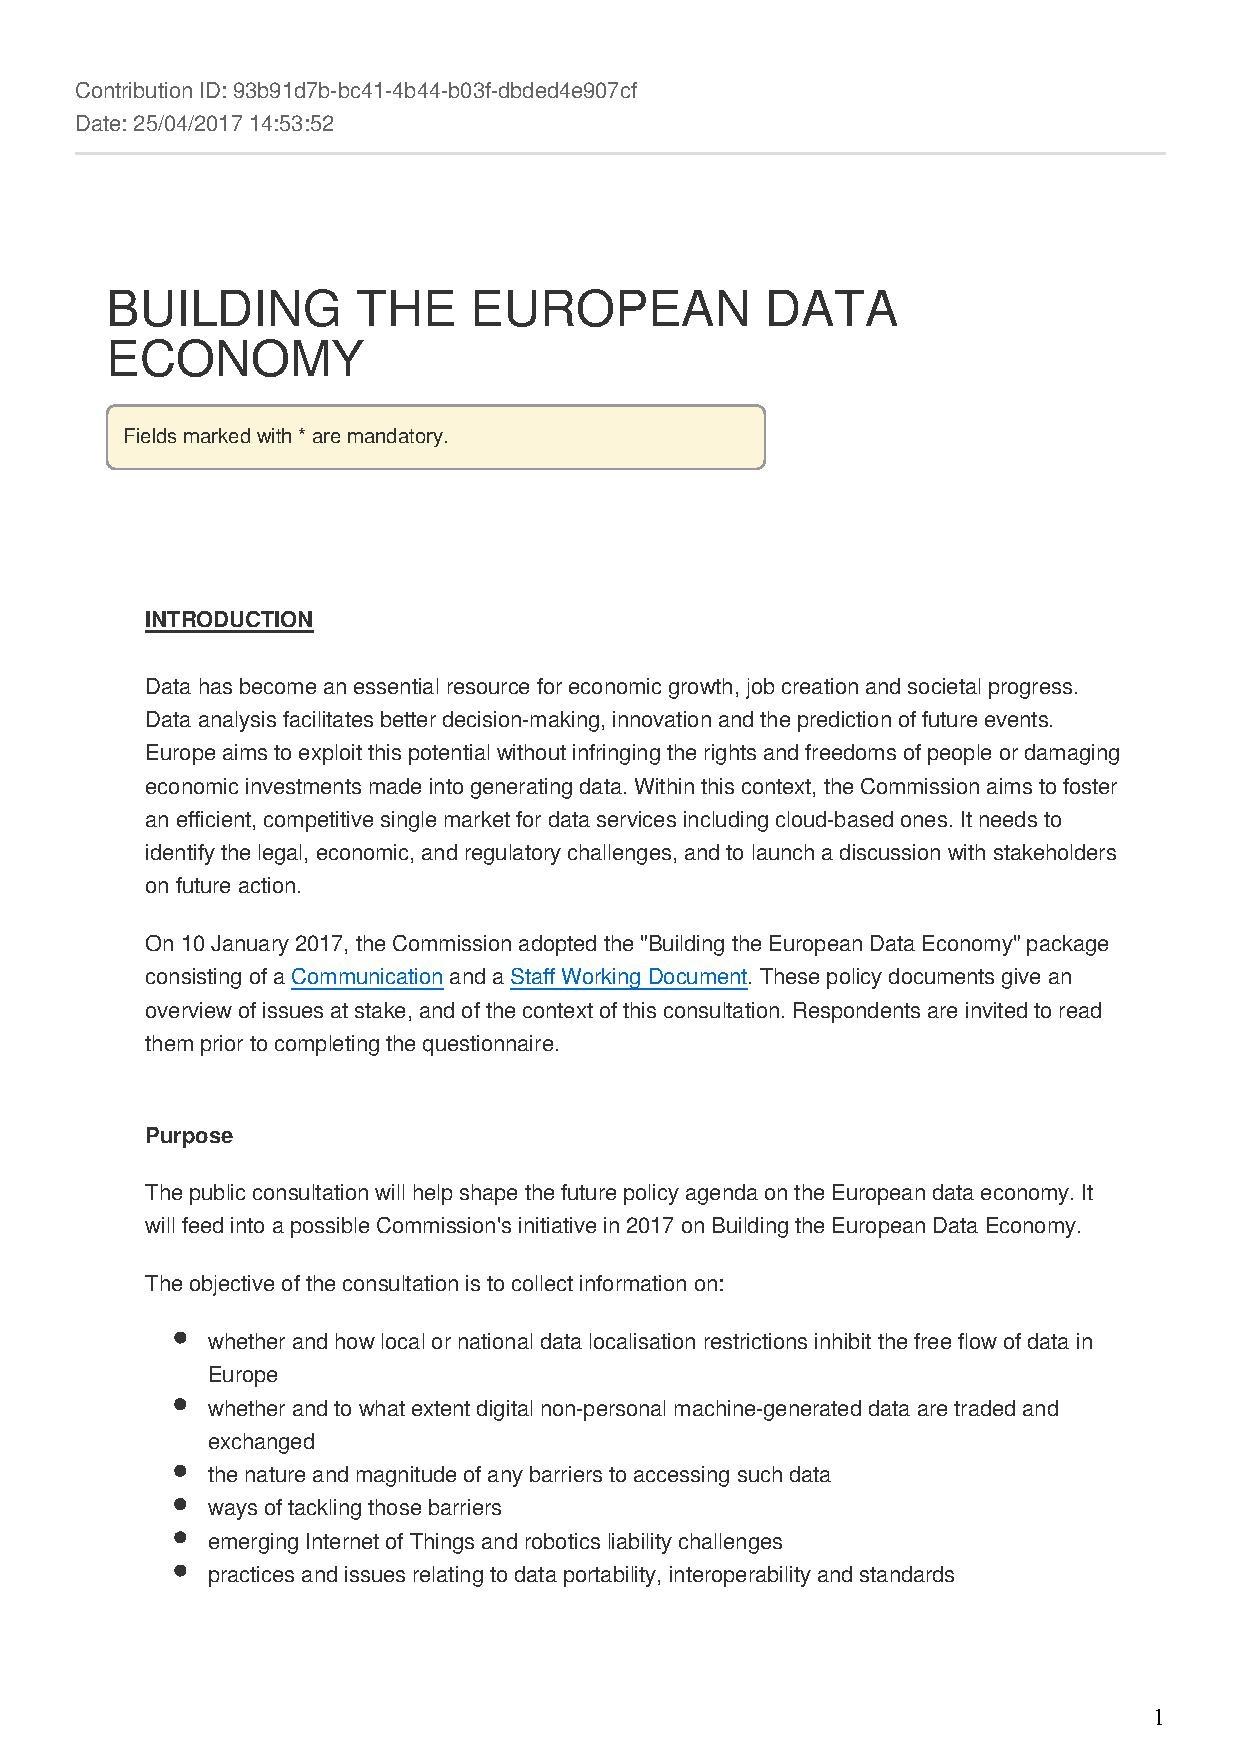 File:European Data Economy Consultation - Answers pdf